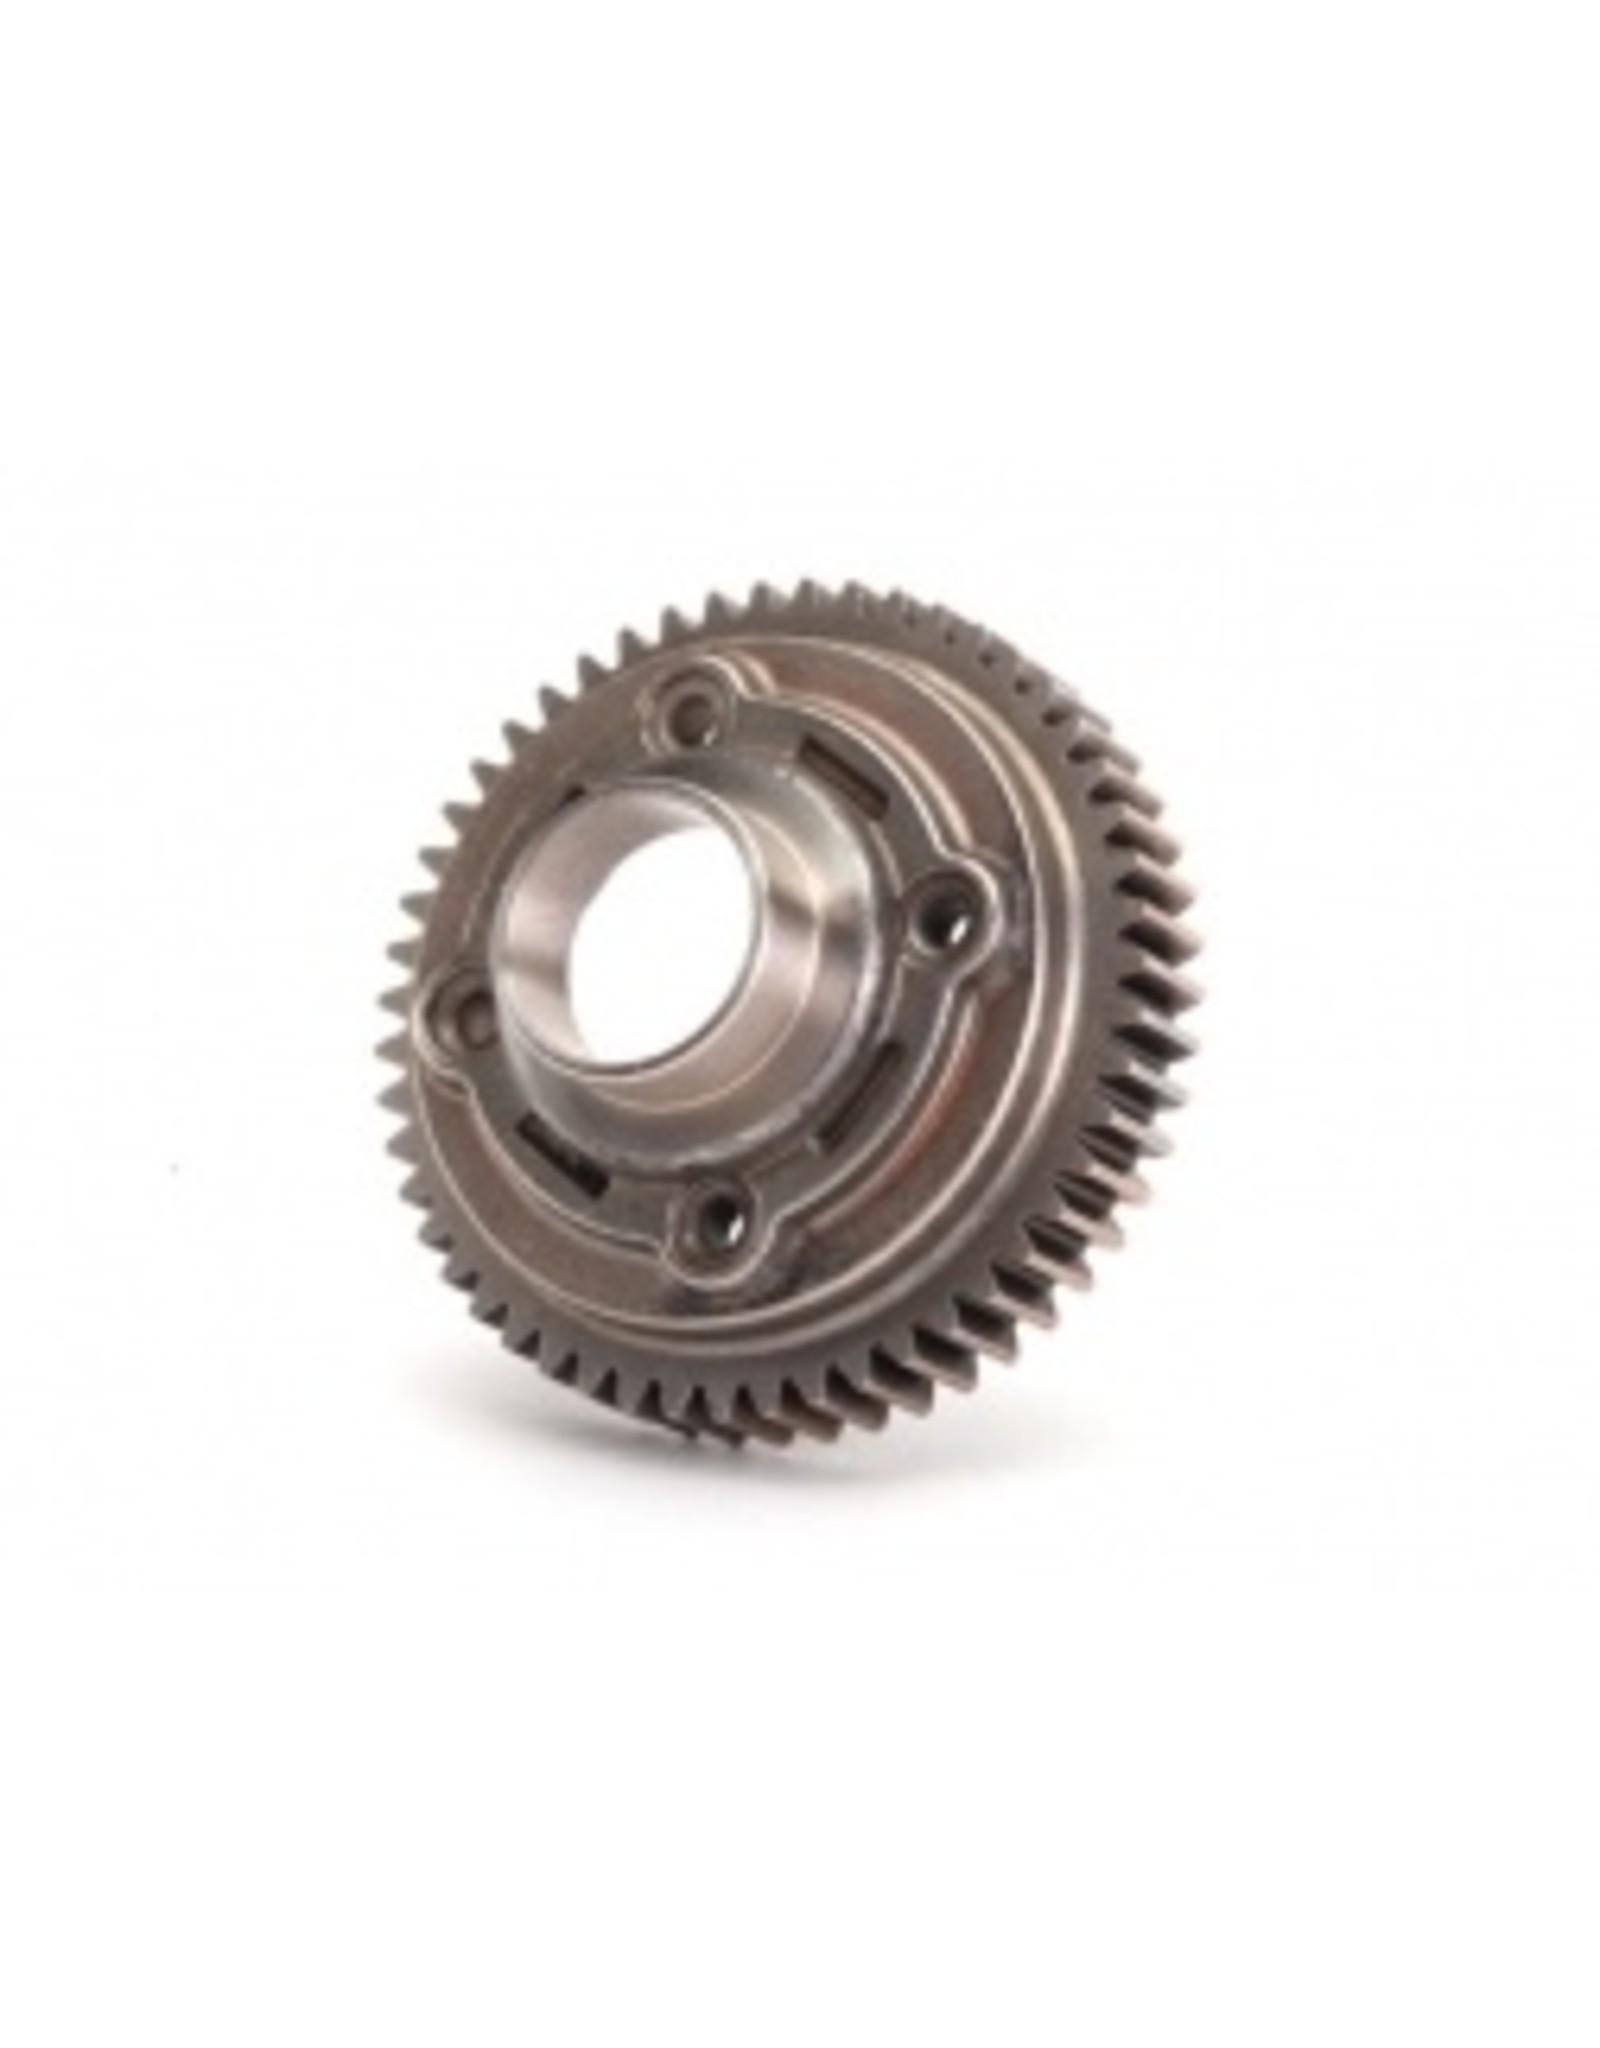 Traxxas Gear, center differential, 51-tooth (spur gear) (8574)